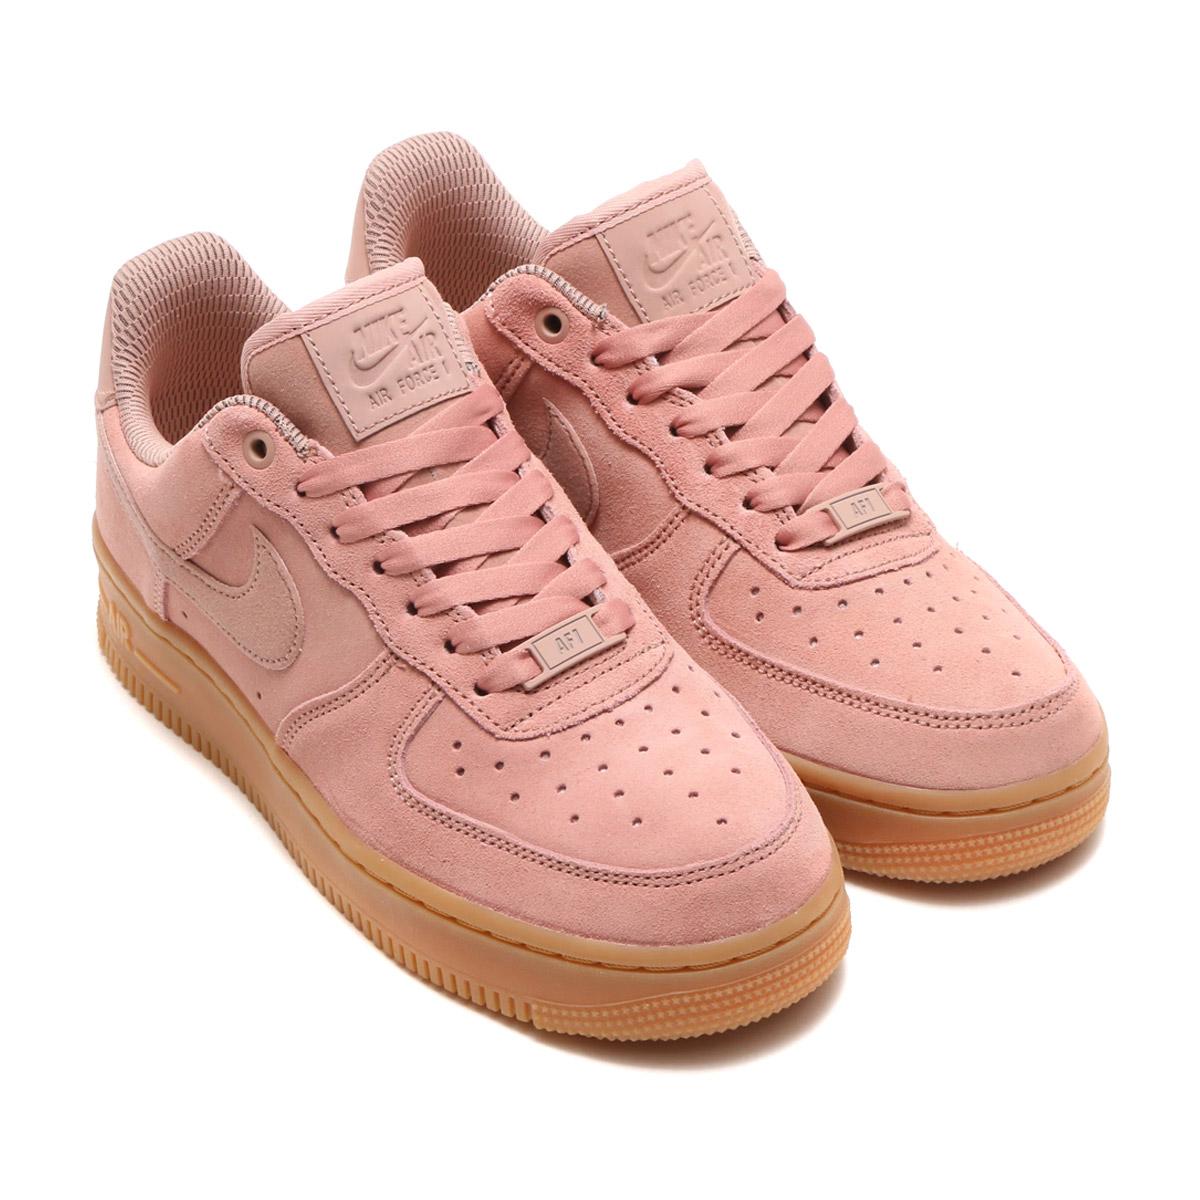 separation shoes 91f2c 0c262 NIKE WMNS AIR FORCE 1  07 SE (Nike women air force 1 07 SE ...